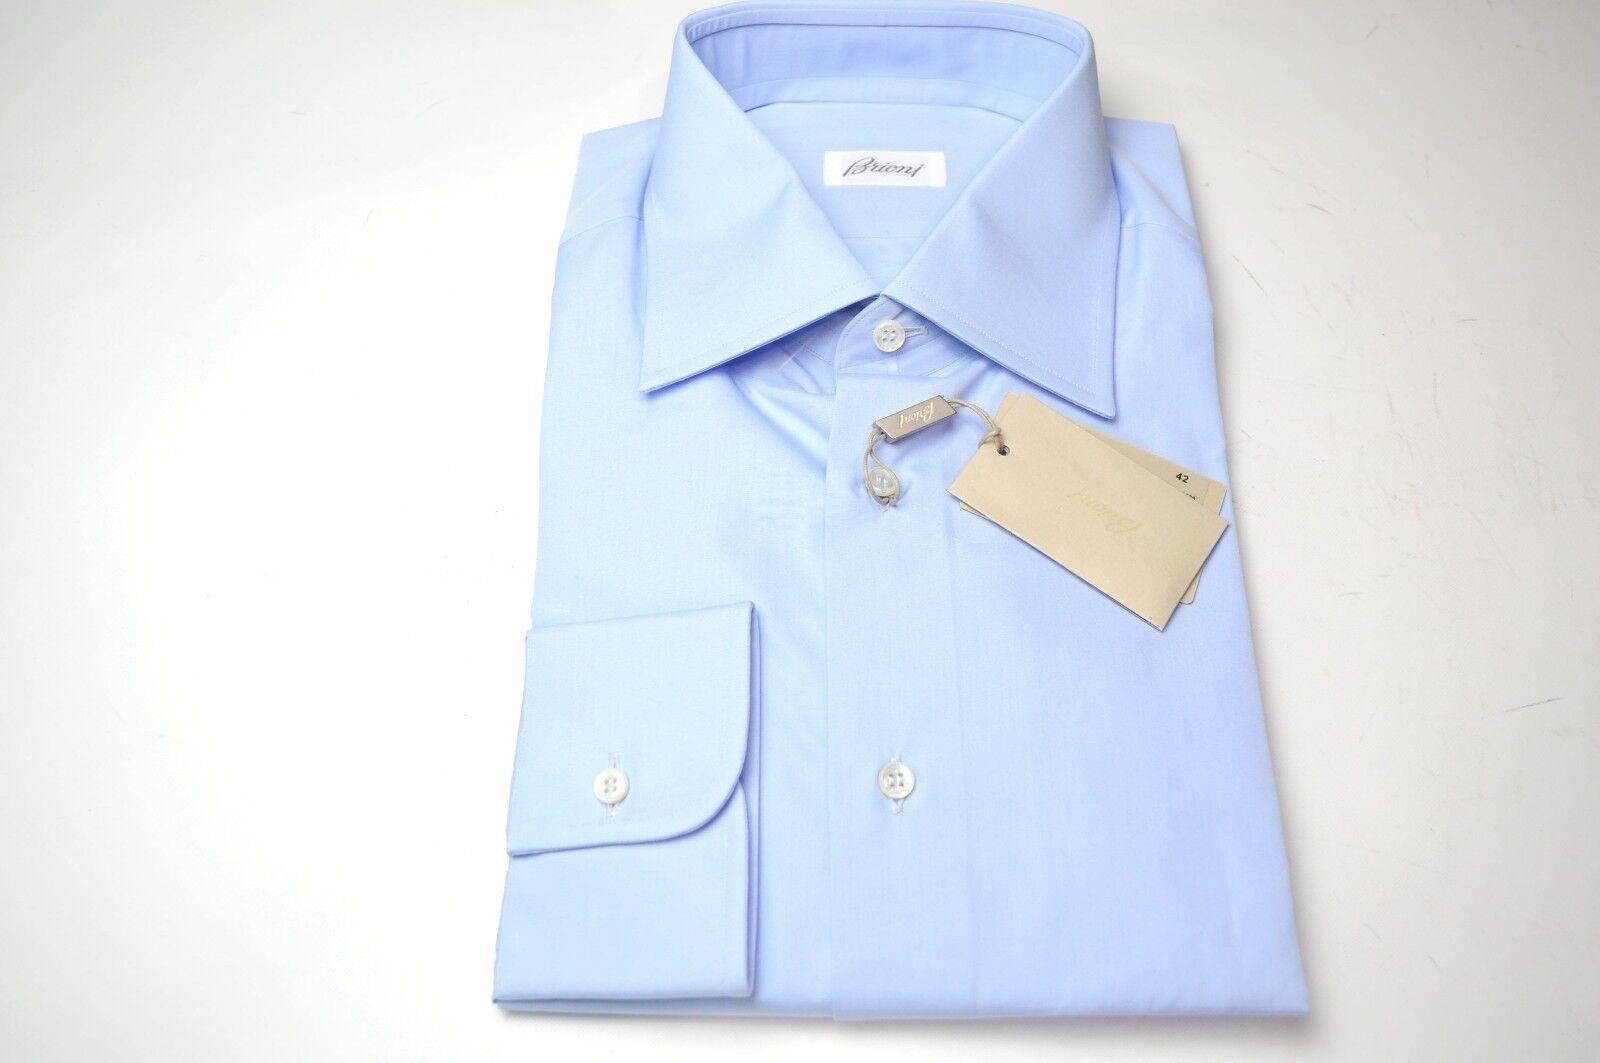 NEW  BRIONI Dress  hemd 100% baumwolle Größe 17 Us 43 Eu  (ARA140)